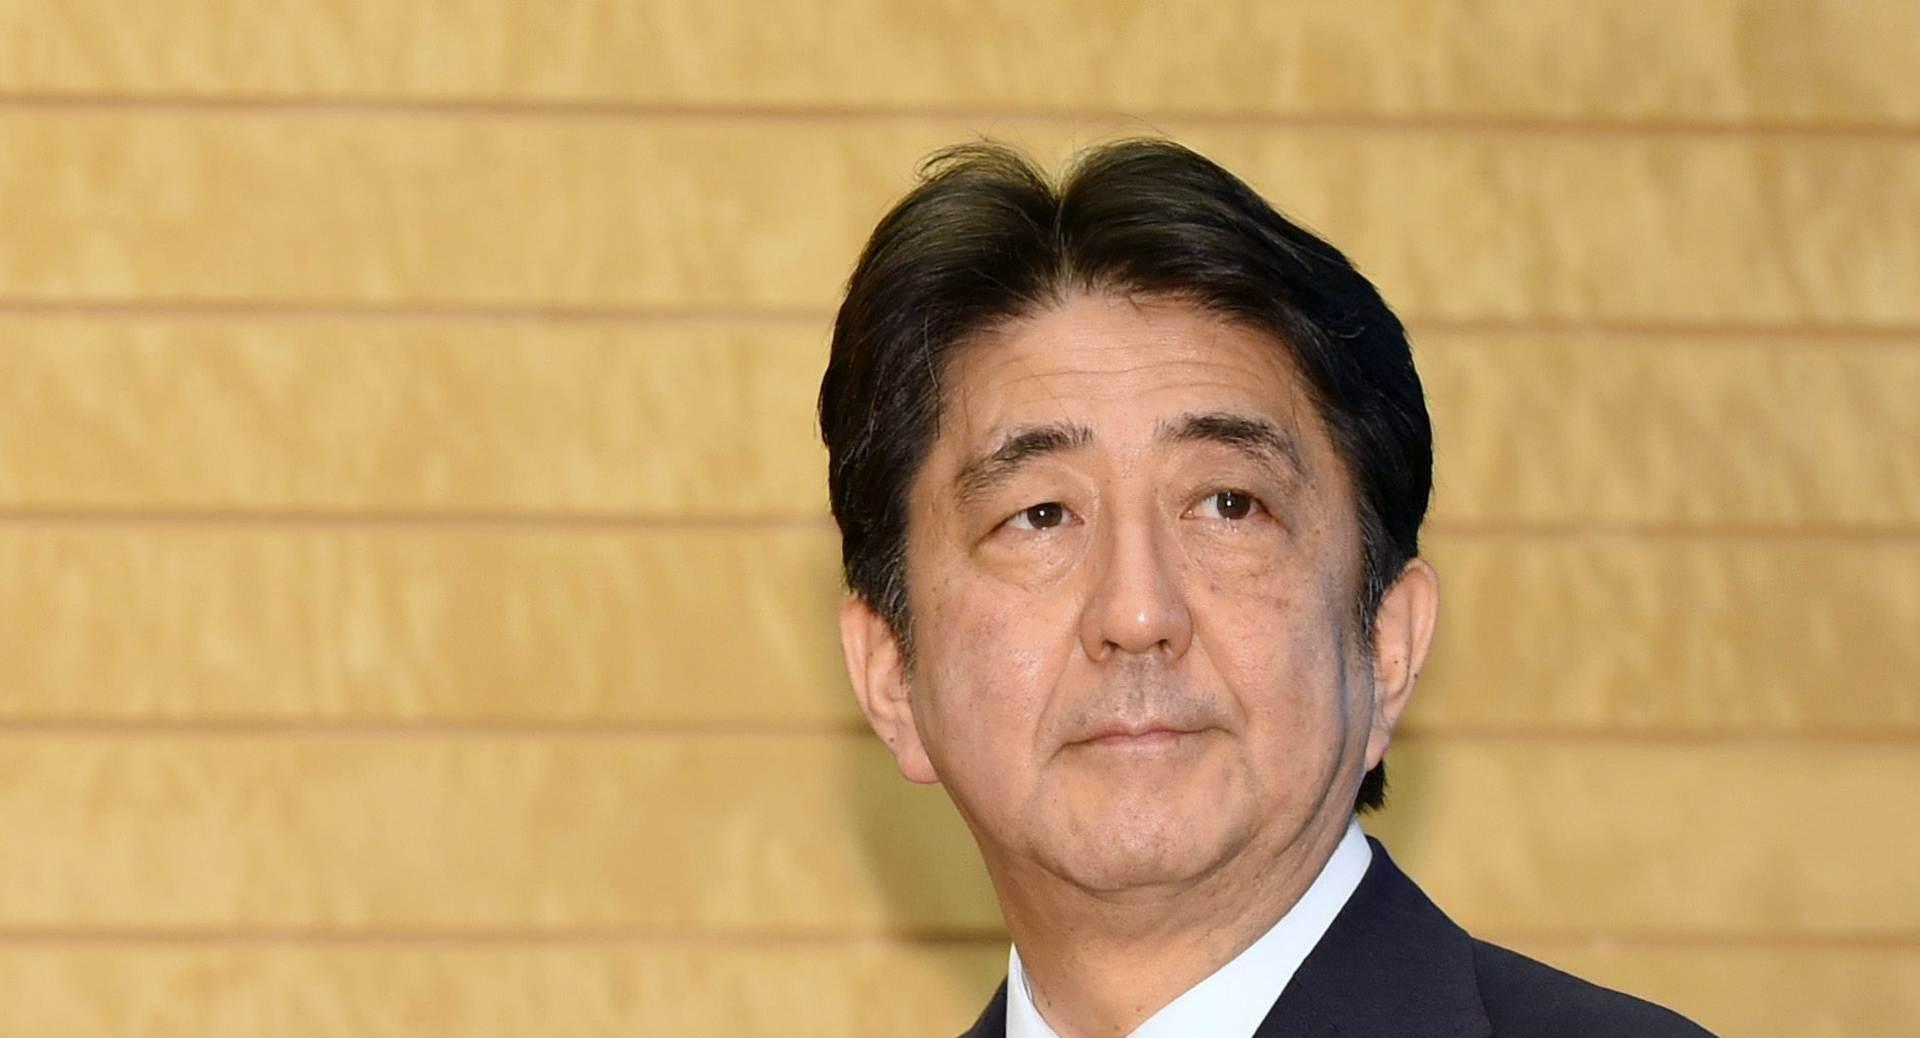 USPJEŠAN GOVOR: snažno raste popularnost Abea